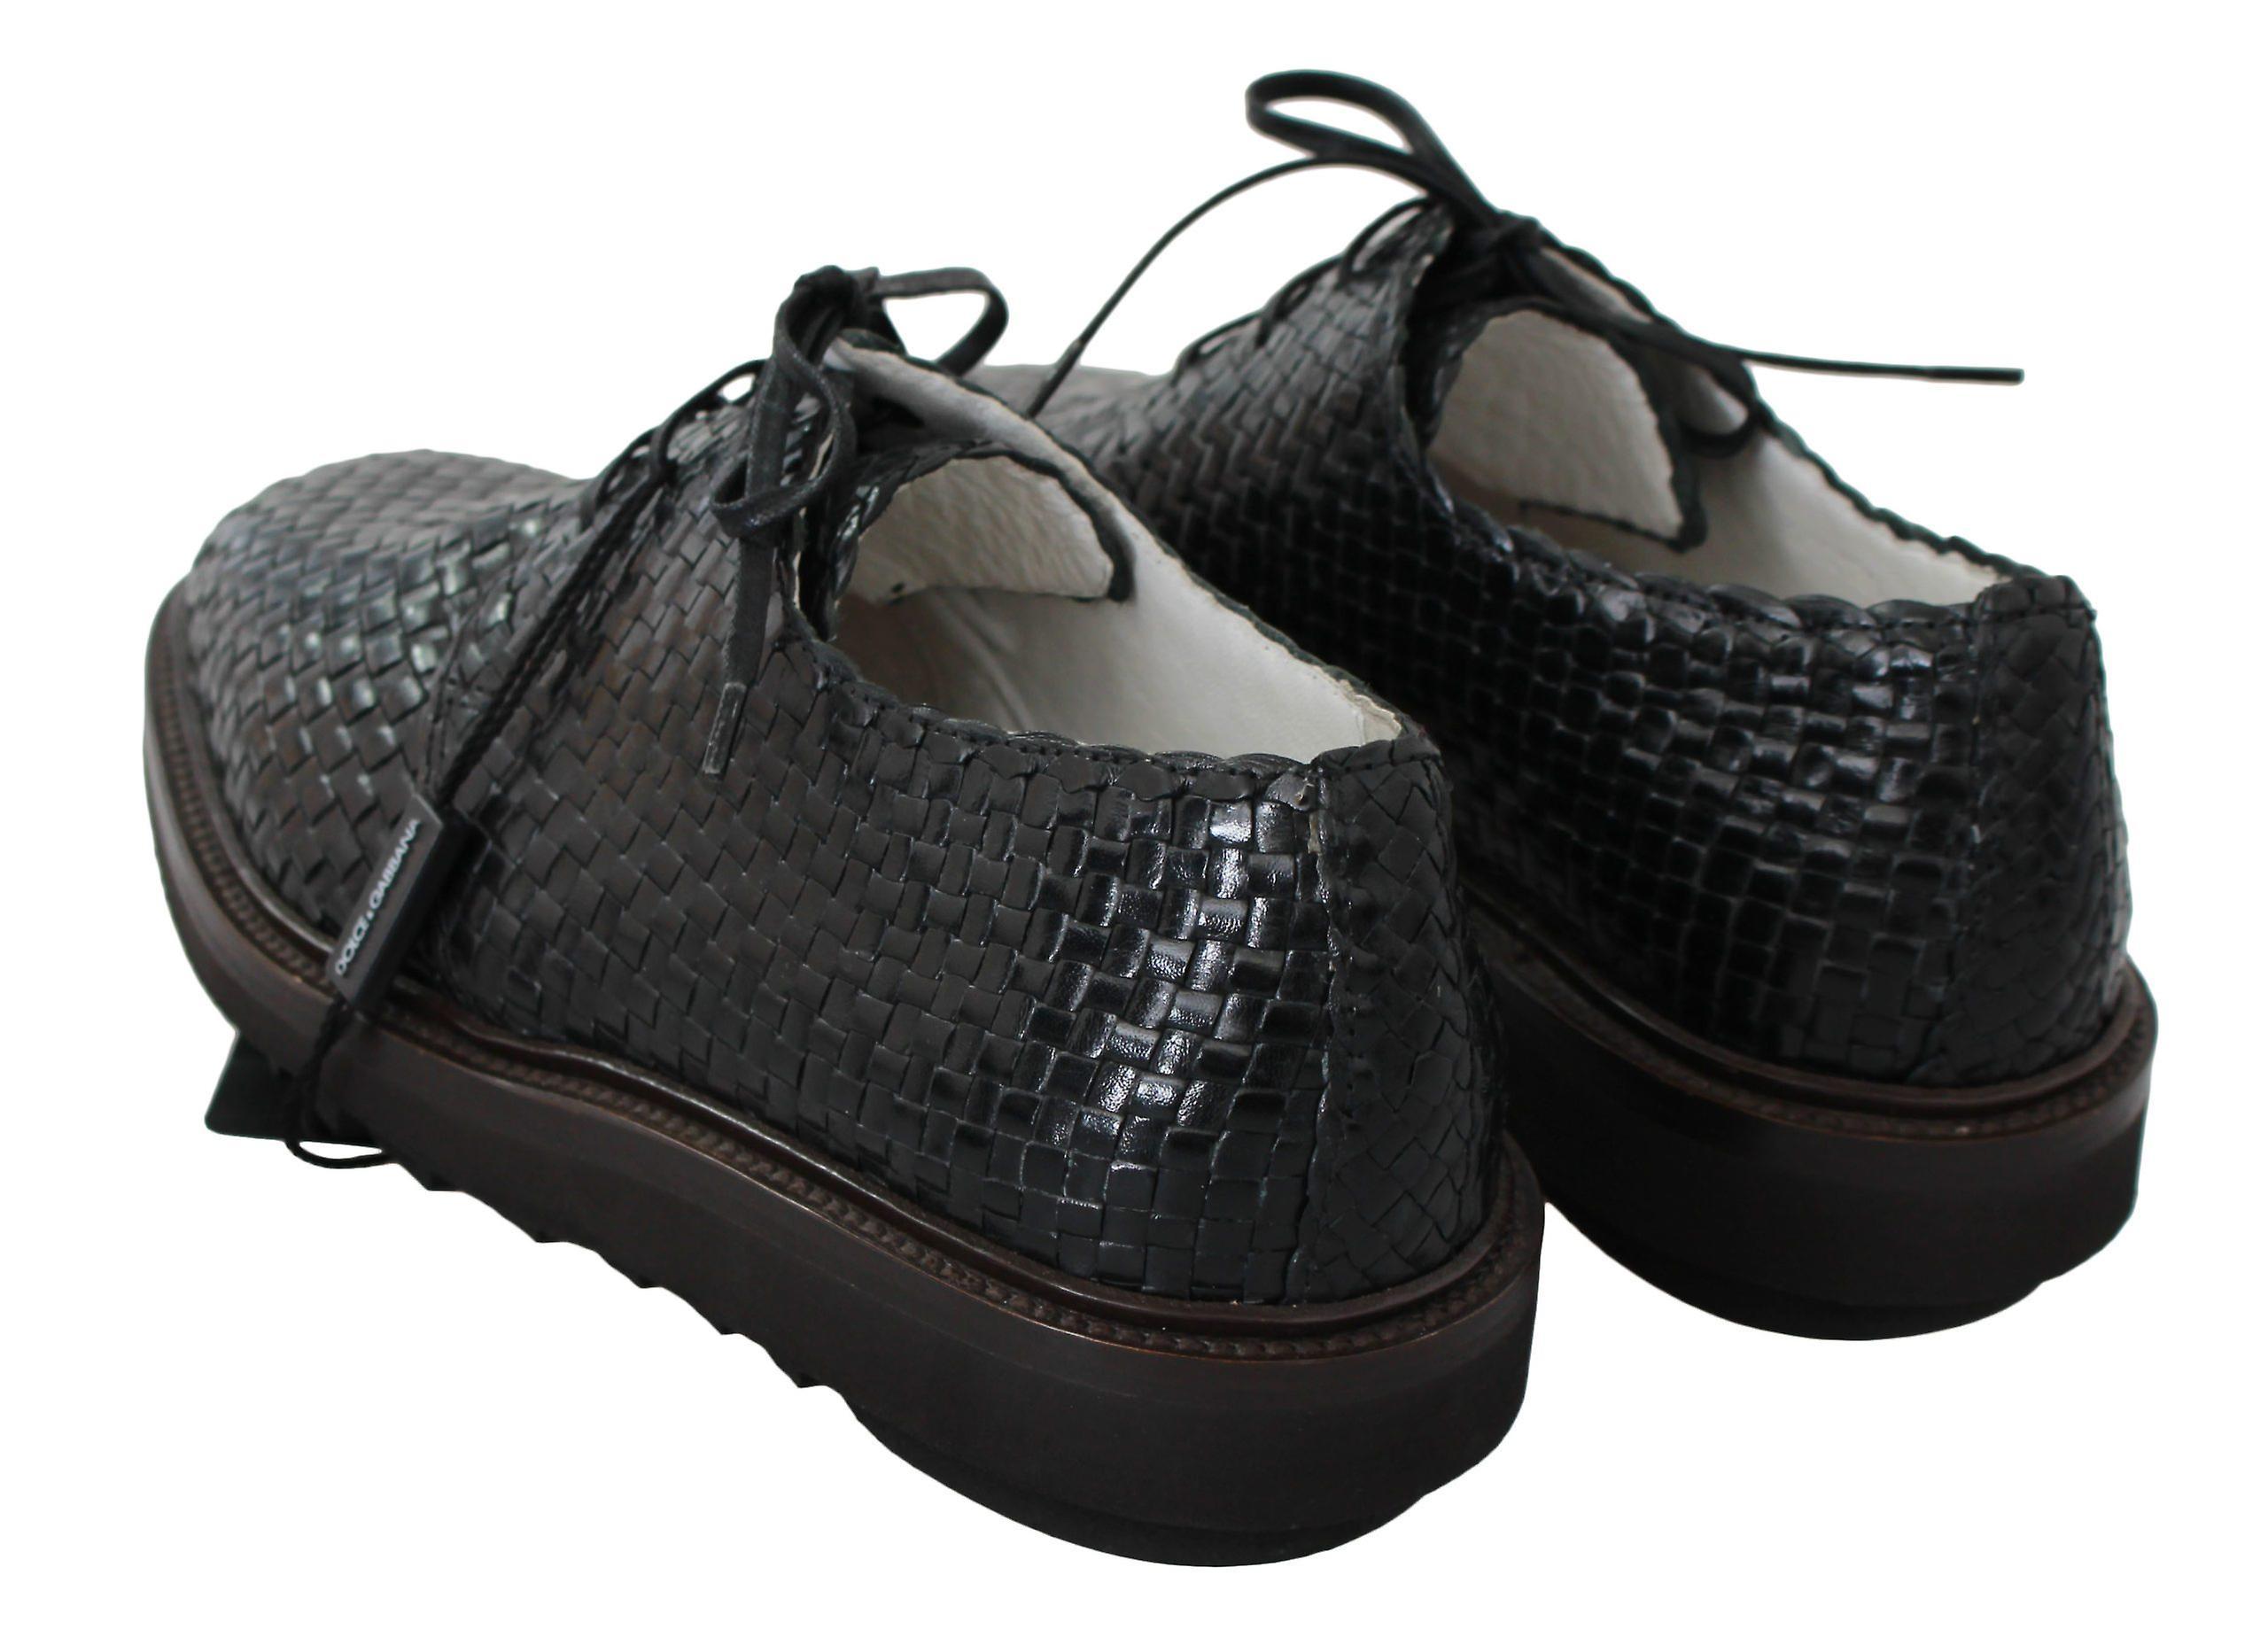 Dolce & Gabbana Black Woven Knit Leather Derby Shoes Mv2506-39